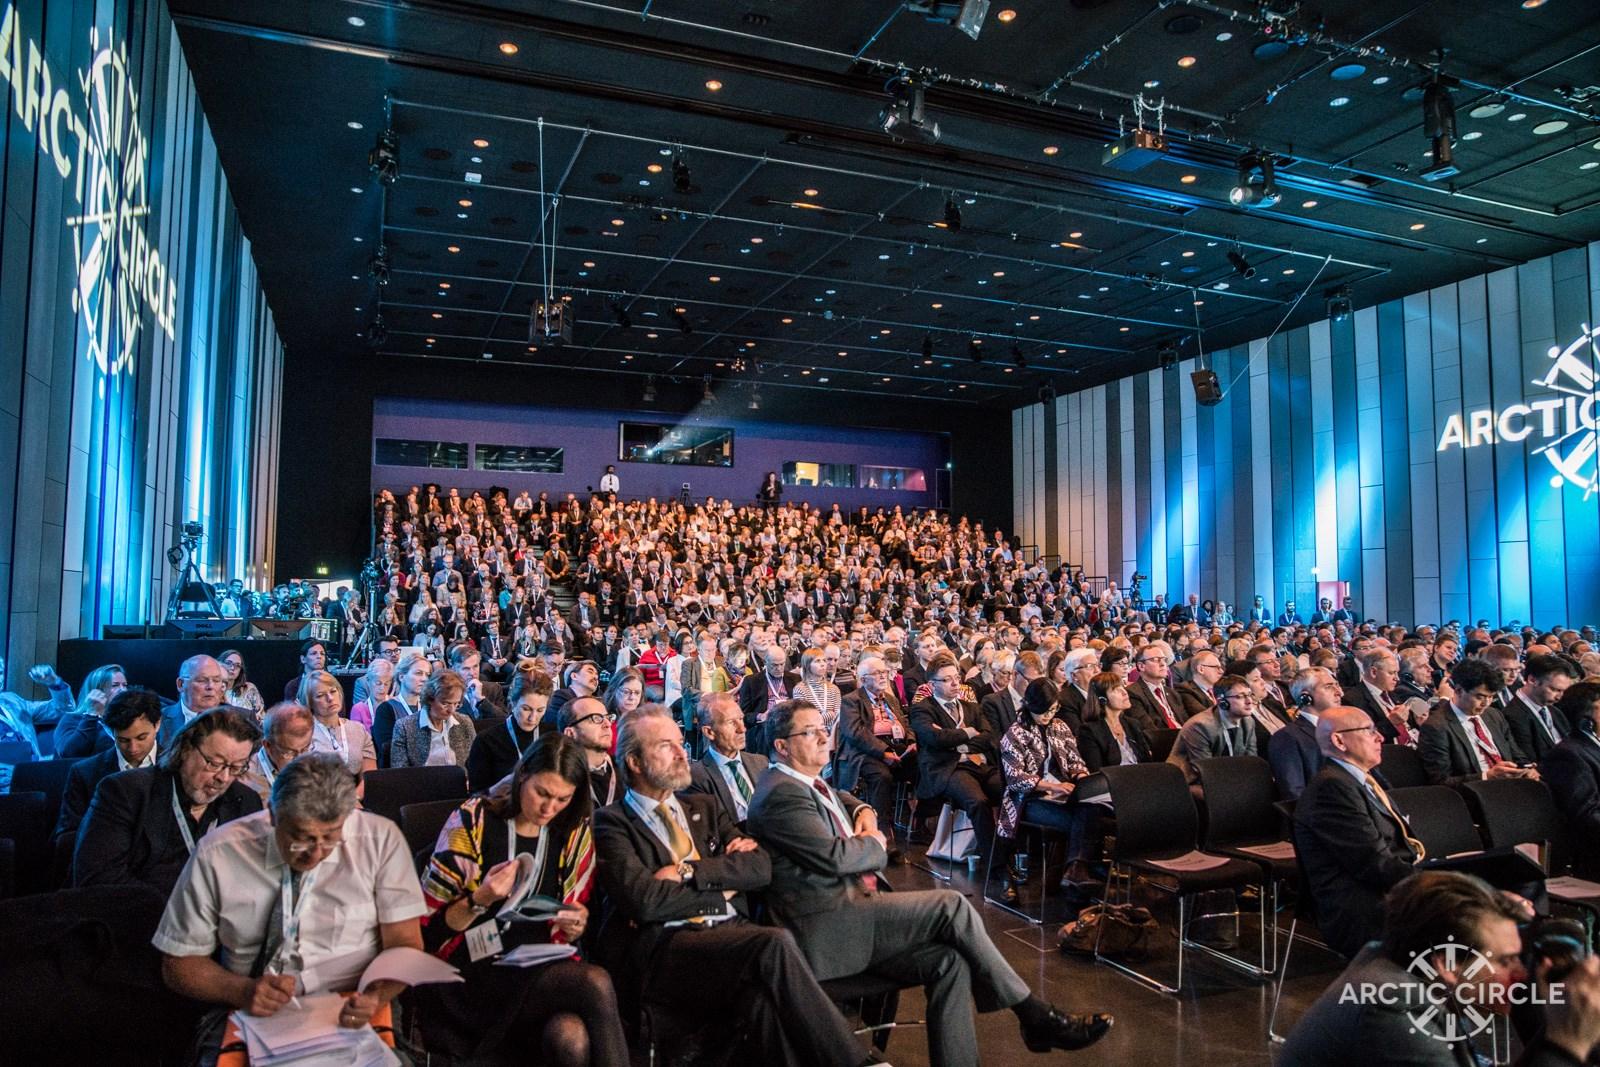 Arctic Circle Assembly, Reykjavik, Iceland, October 2016. (Arctic Circle)